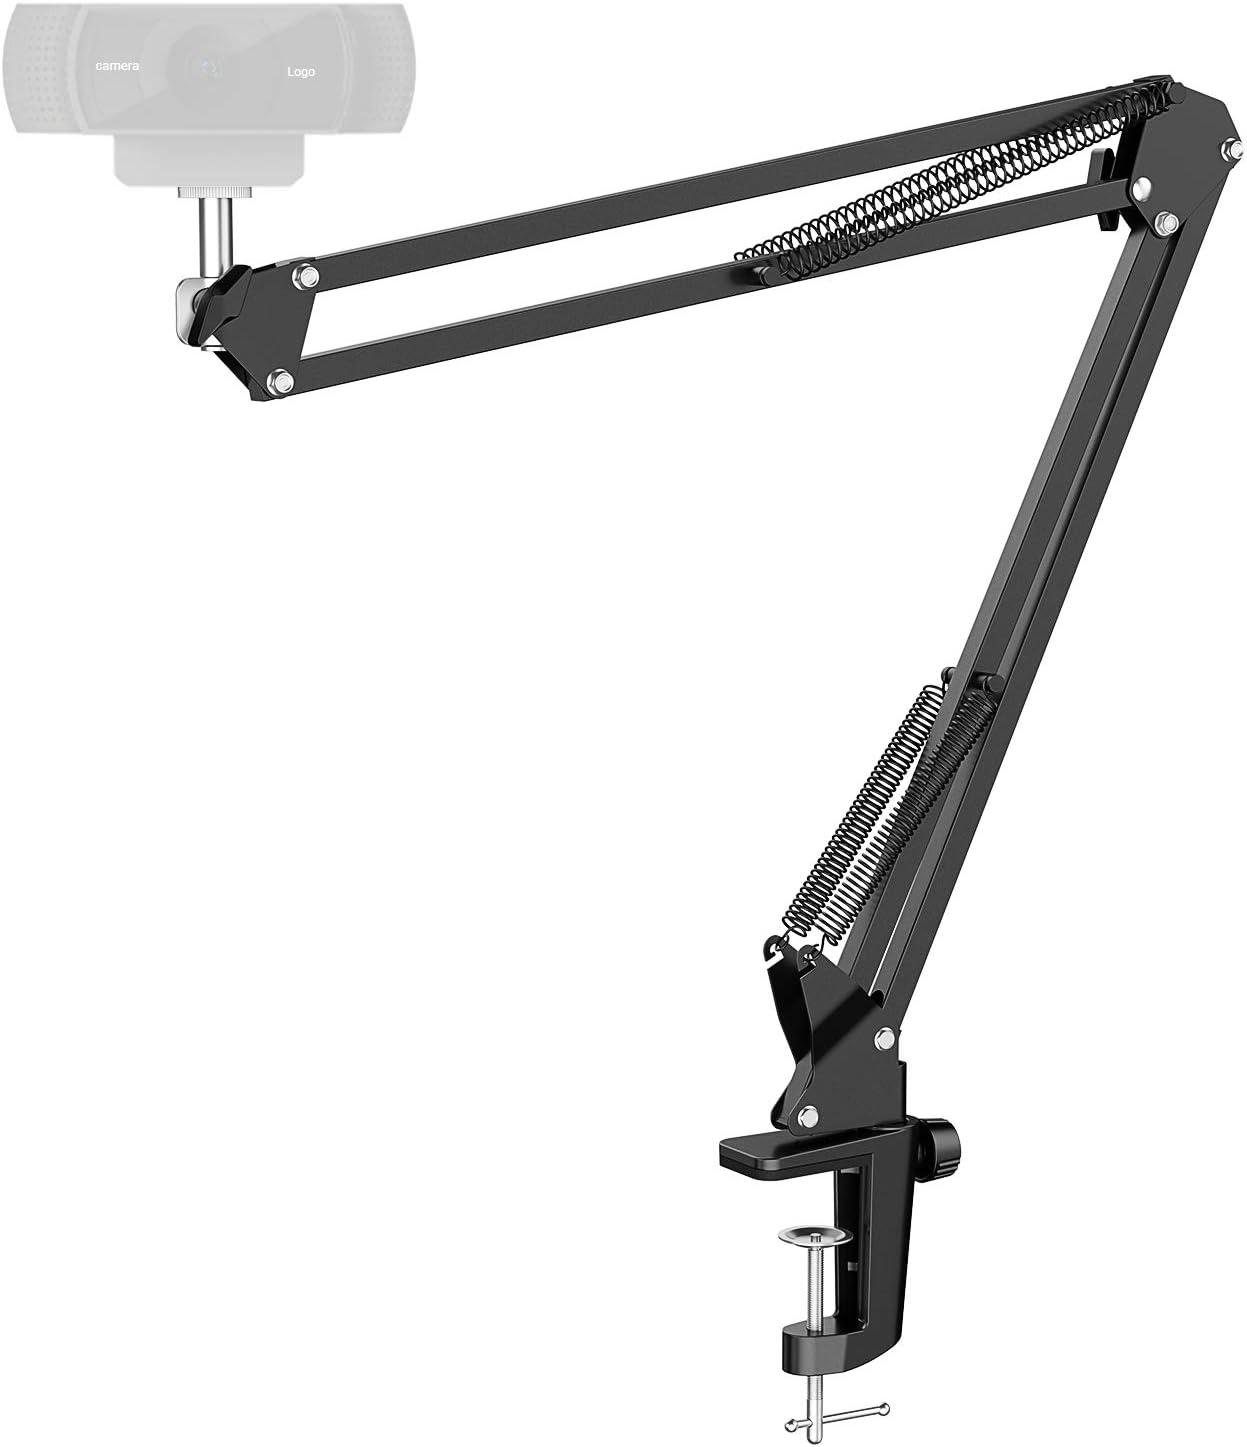 Amada Webcam Stand, Webcam Clamp Mount Adjustable Suspension Boom Scissor Arm Stand for Logitech Webcam C922x C930e C930 C920 C615 C930e C925e Brio 4K, GoPro Hero 8/7/6/5/4